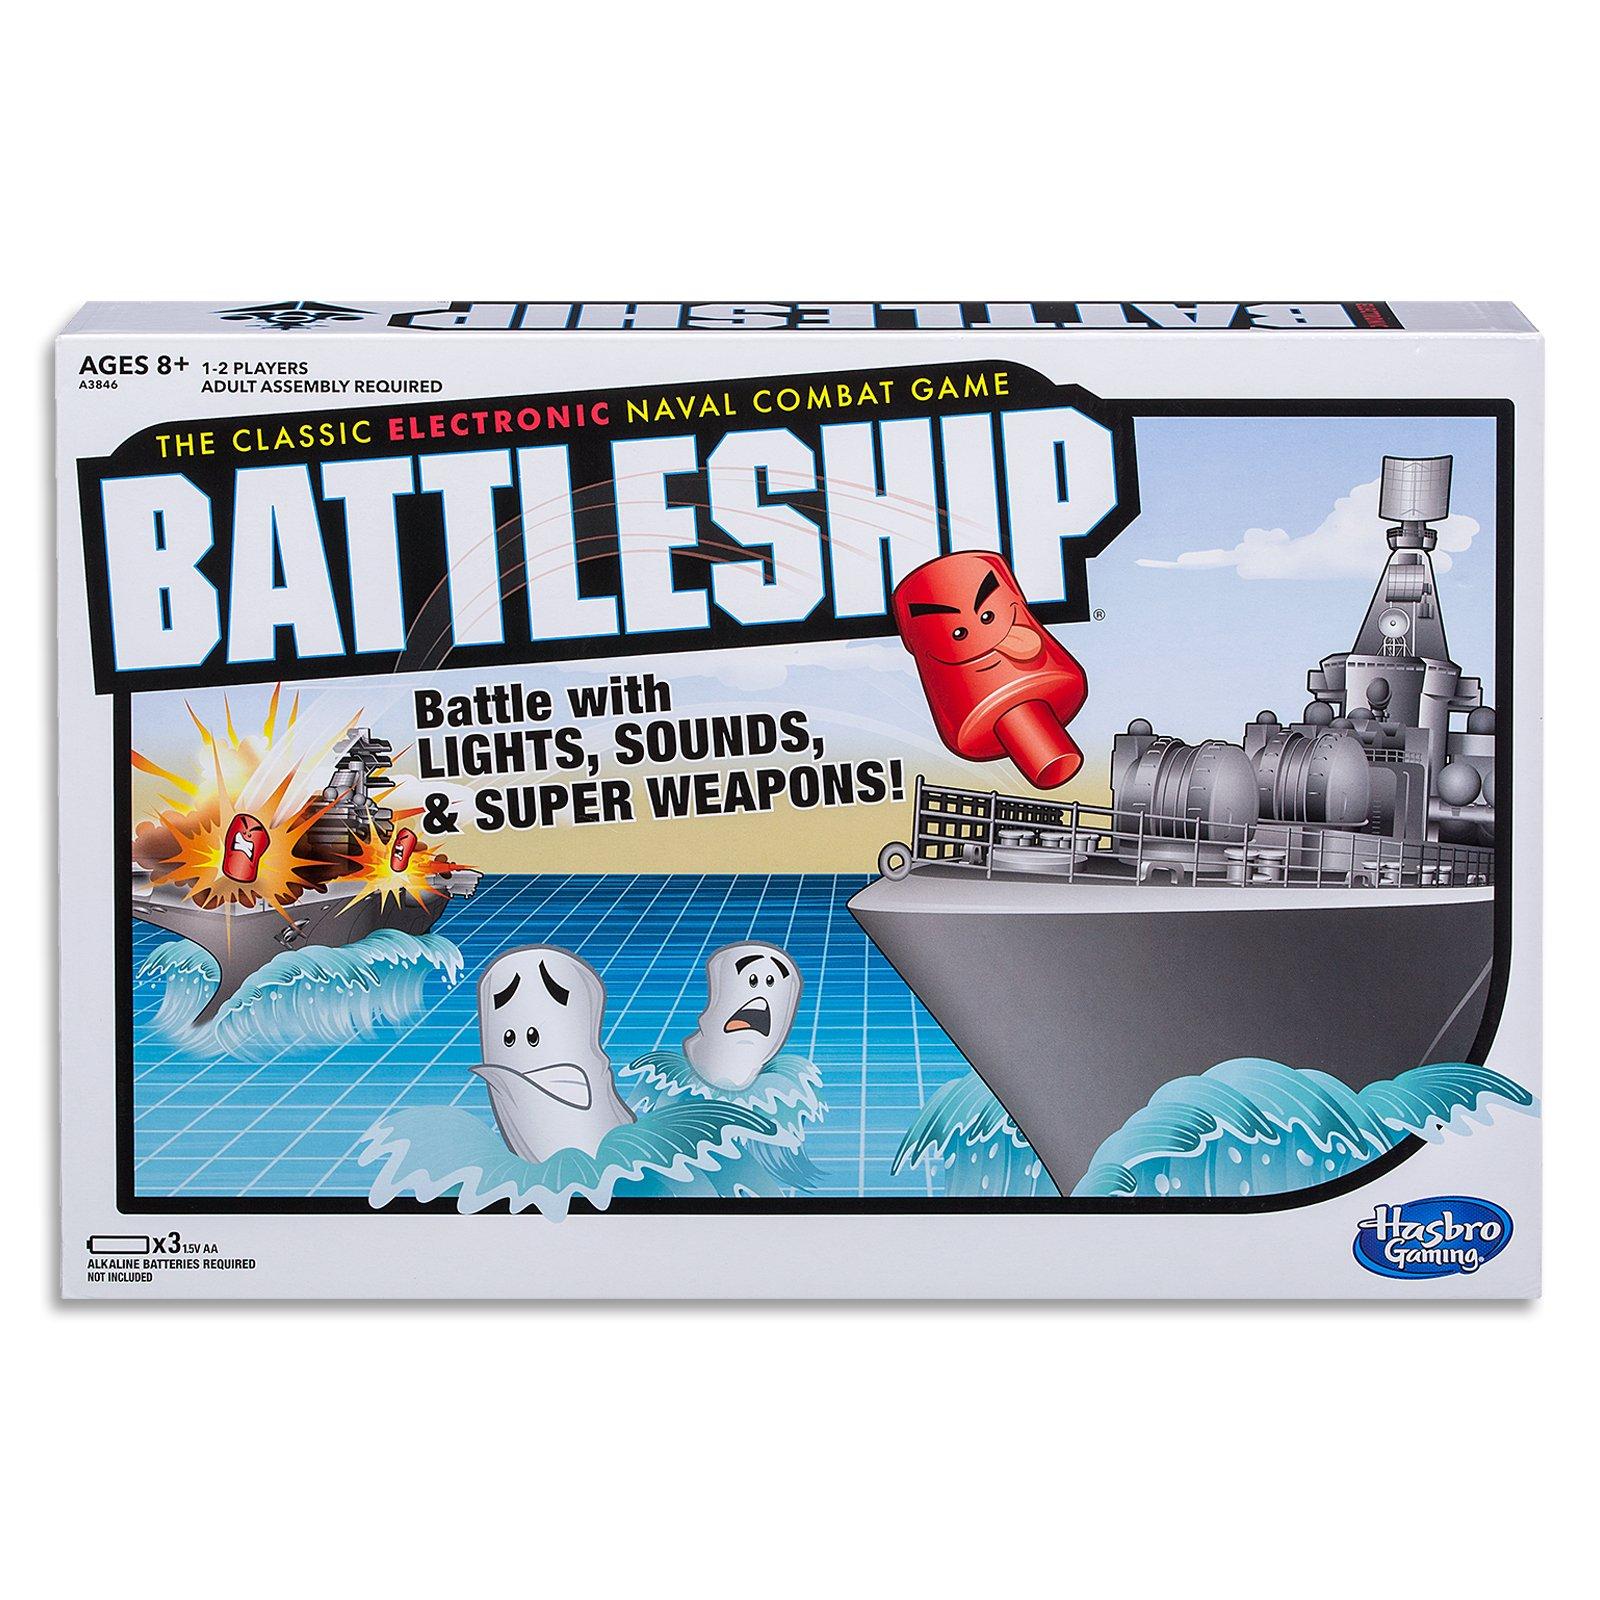 Battleship games 2 player codes double down casino facebook